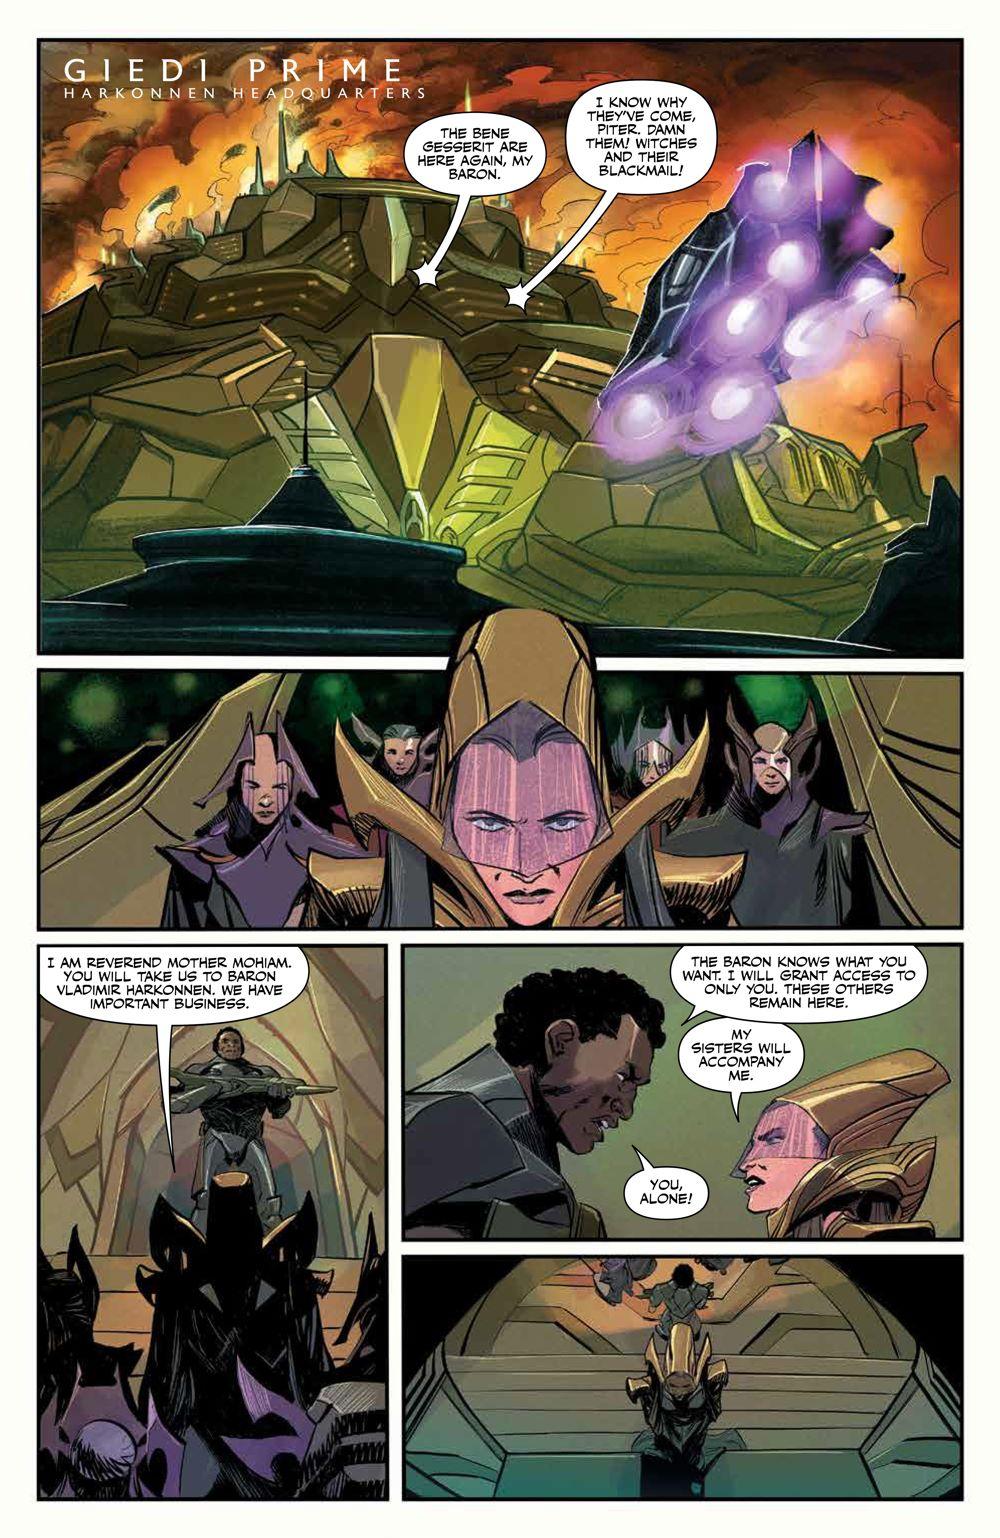 Dune_HouseAtreides_007_PRESS_6 ComicList Previews: DUNE HOUSE ATREIDES #7 (OF 12)